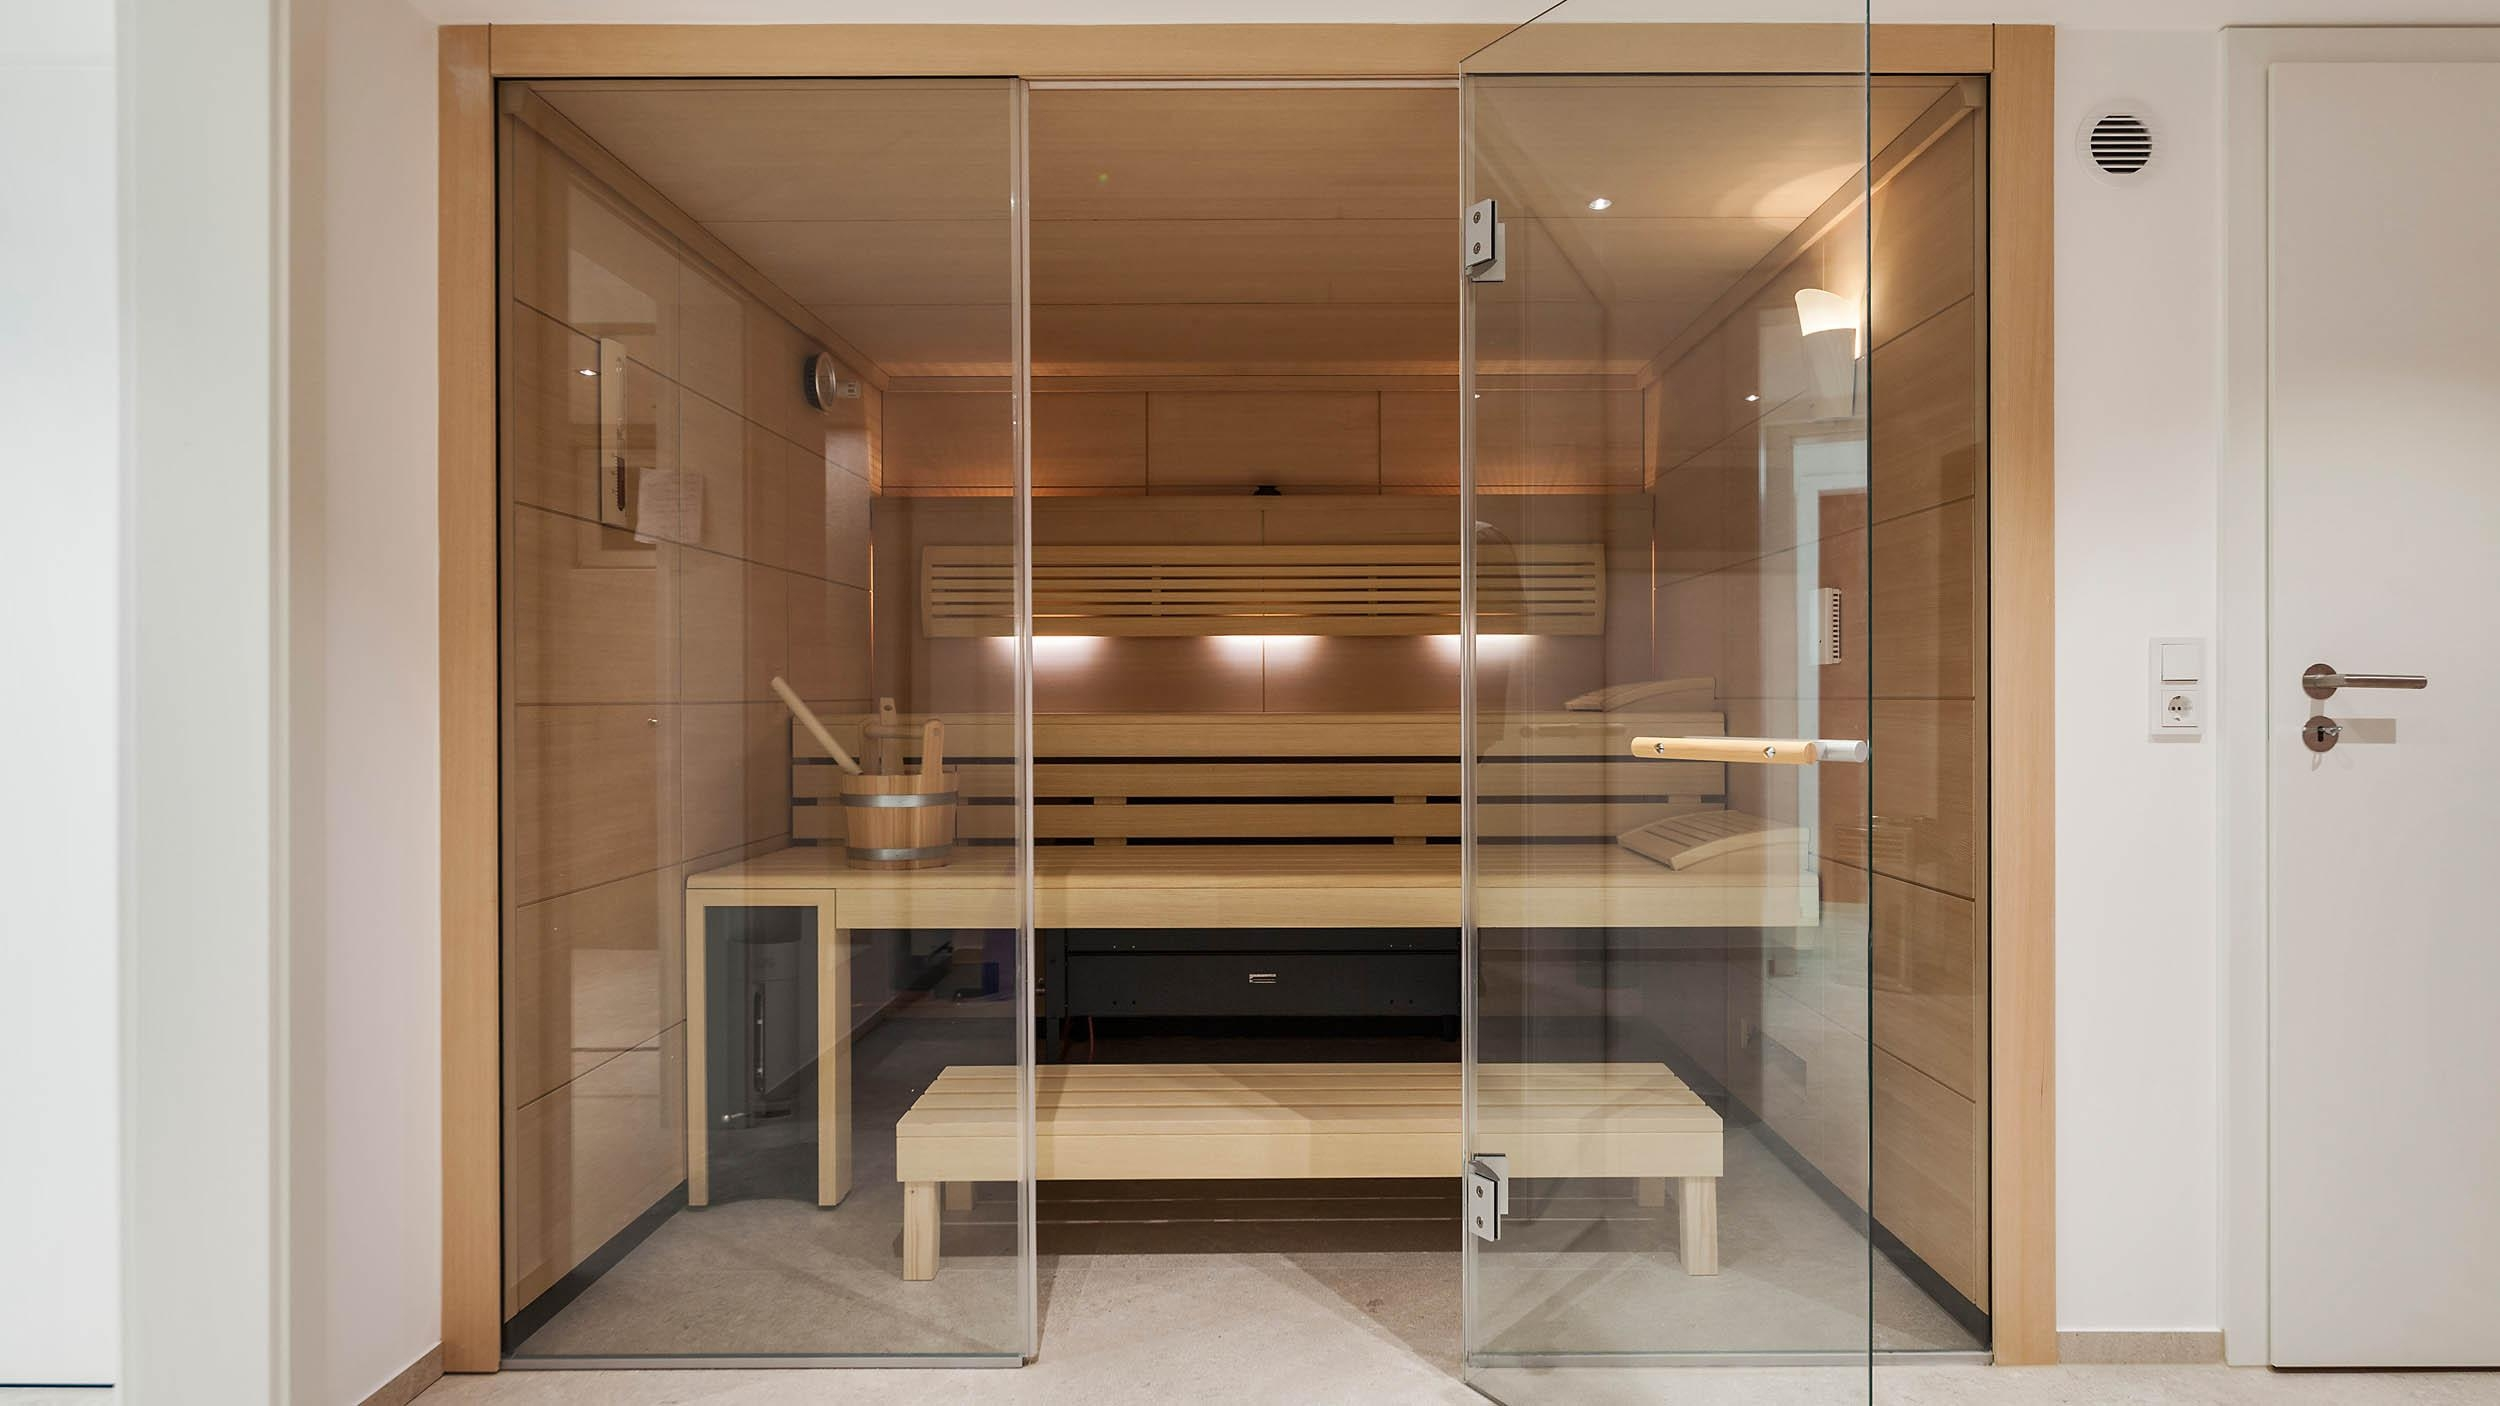 #bestebadstudios #badezimmer #bad #sauna #modernesbadezimmer #holz #wellness